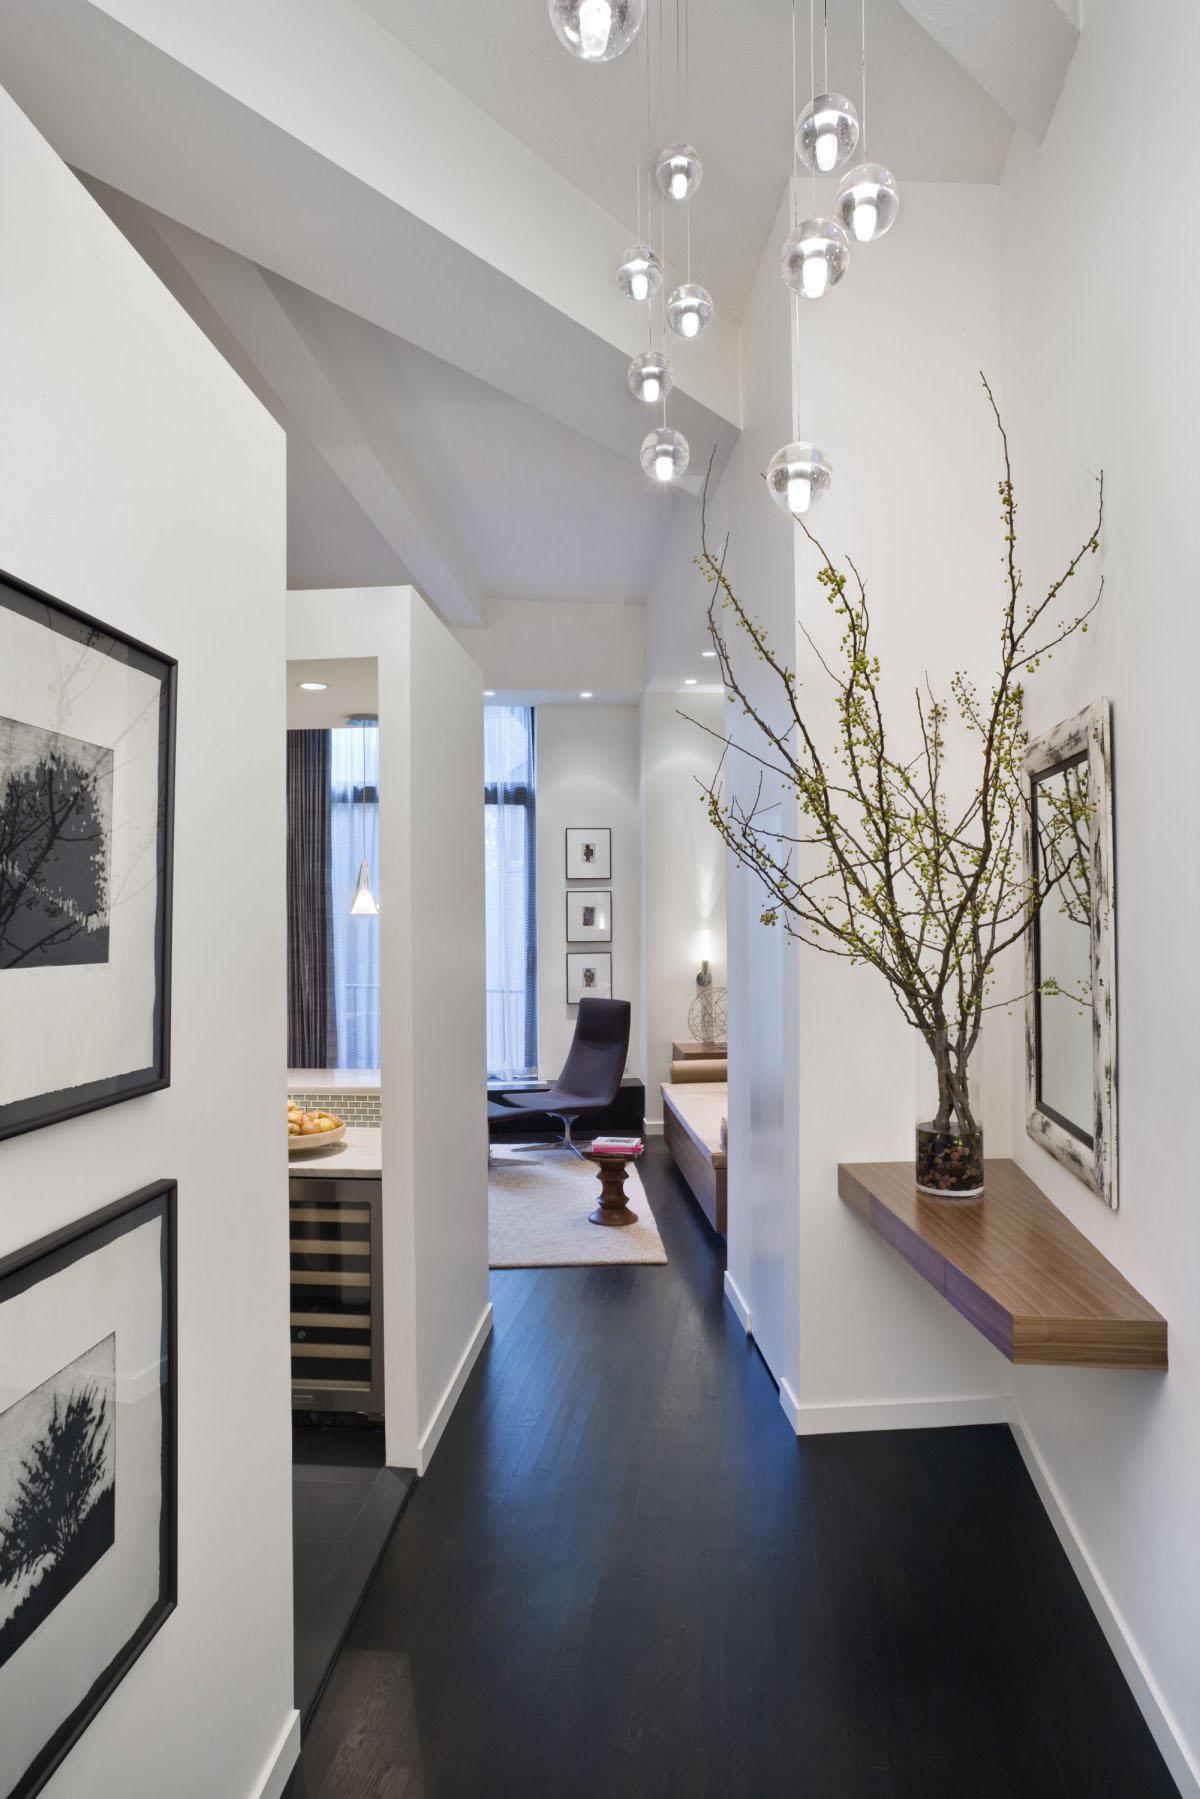 Loft Style Apartment Design In New York  iDesignArch  Interior Design Architecture  Interior